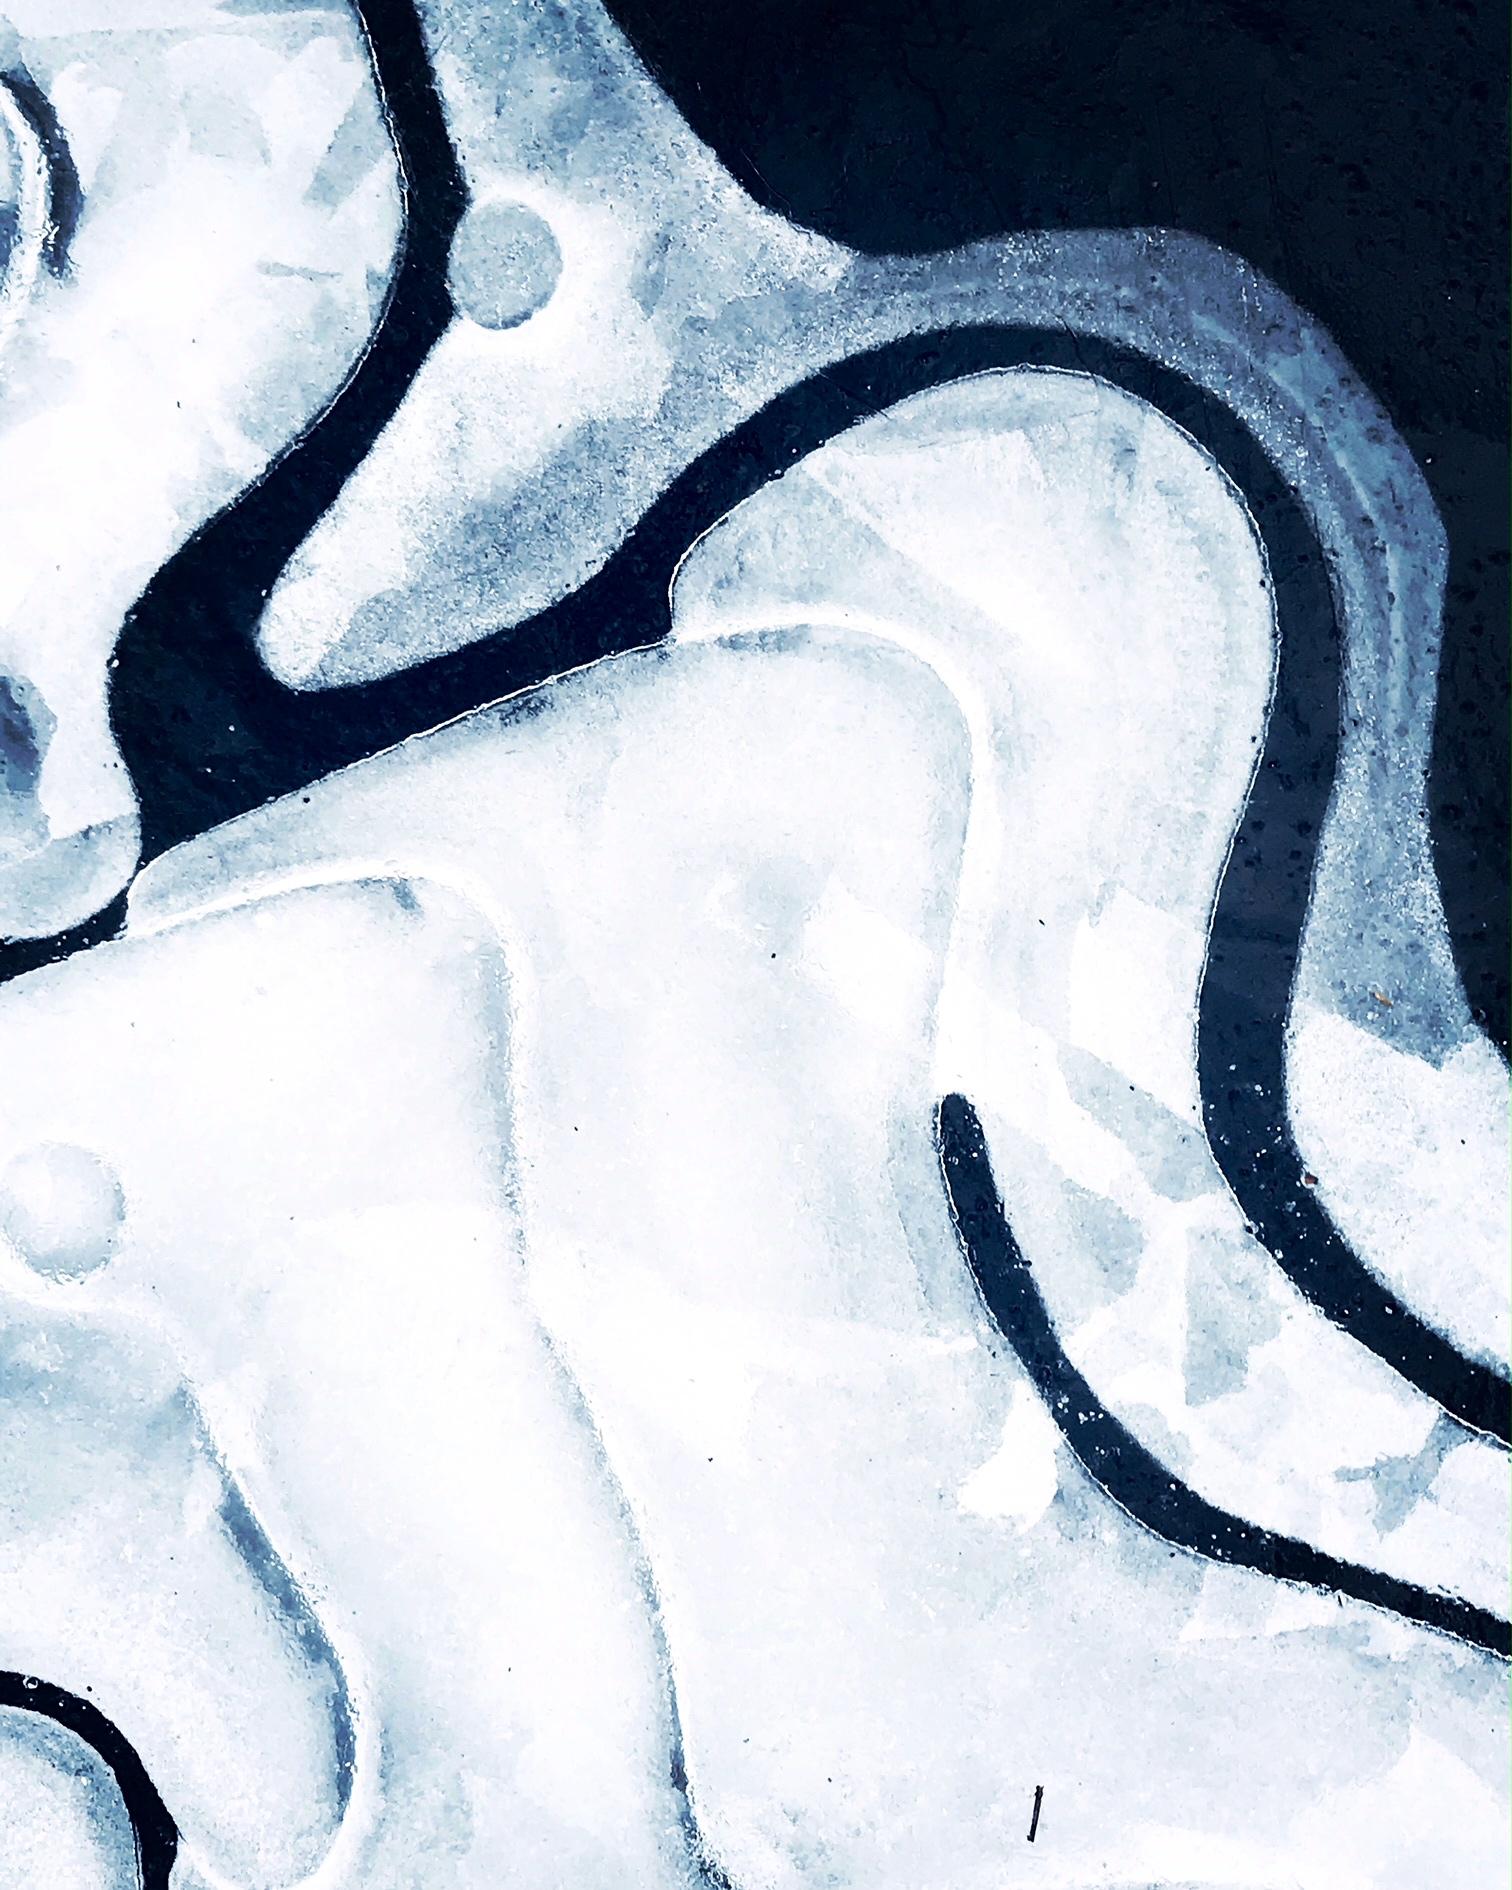 ice abstract.JPG